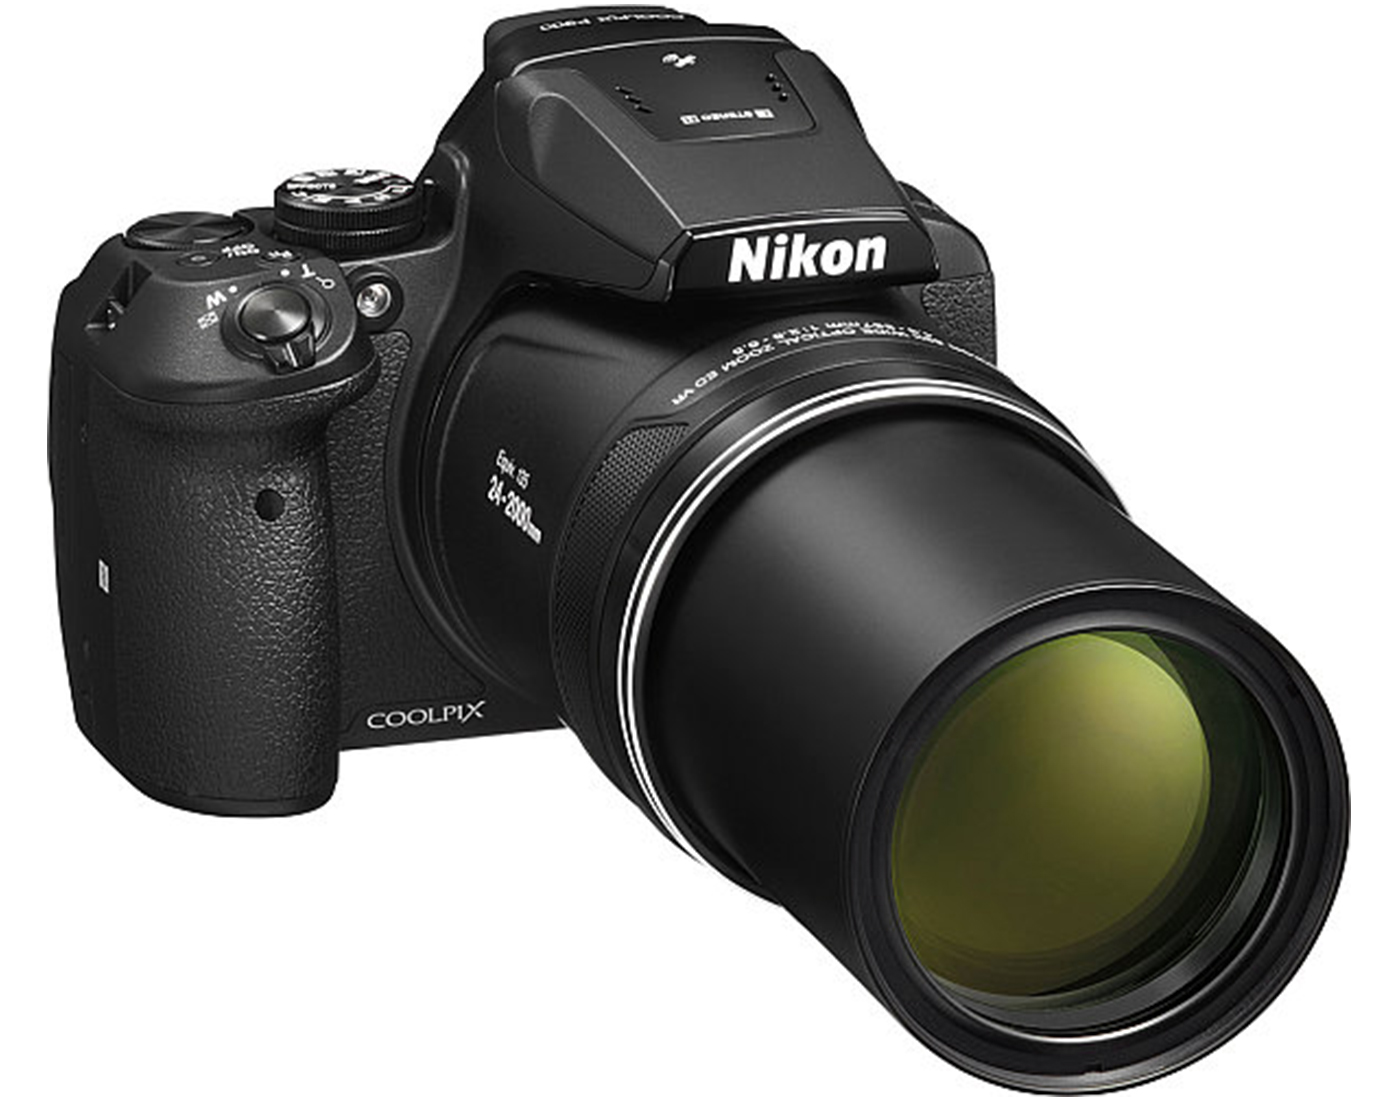 Nikon COOLPIX P900 Zoomed Cameraplex